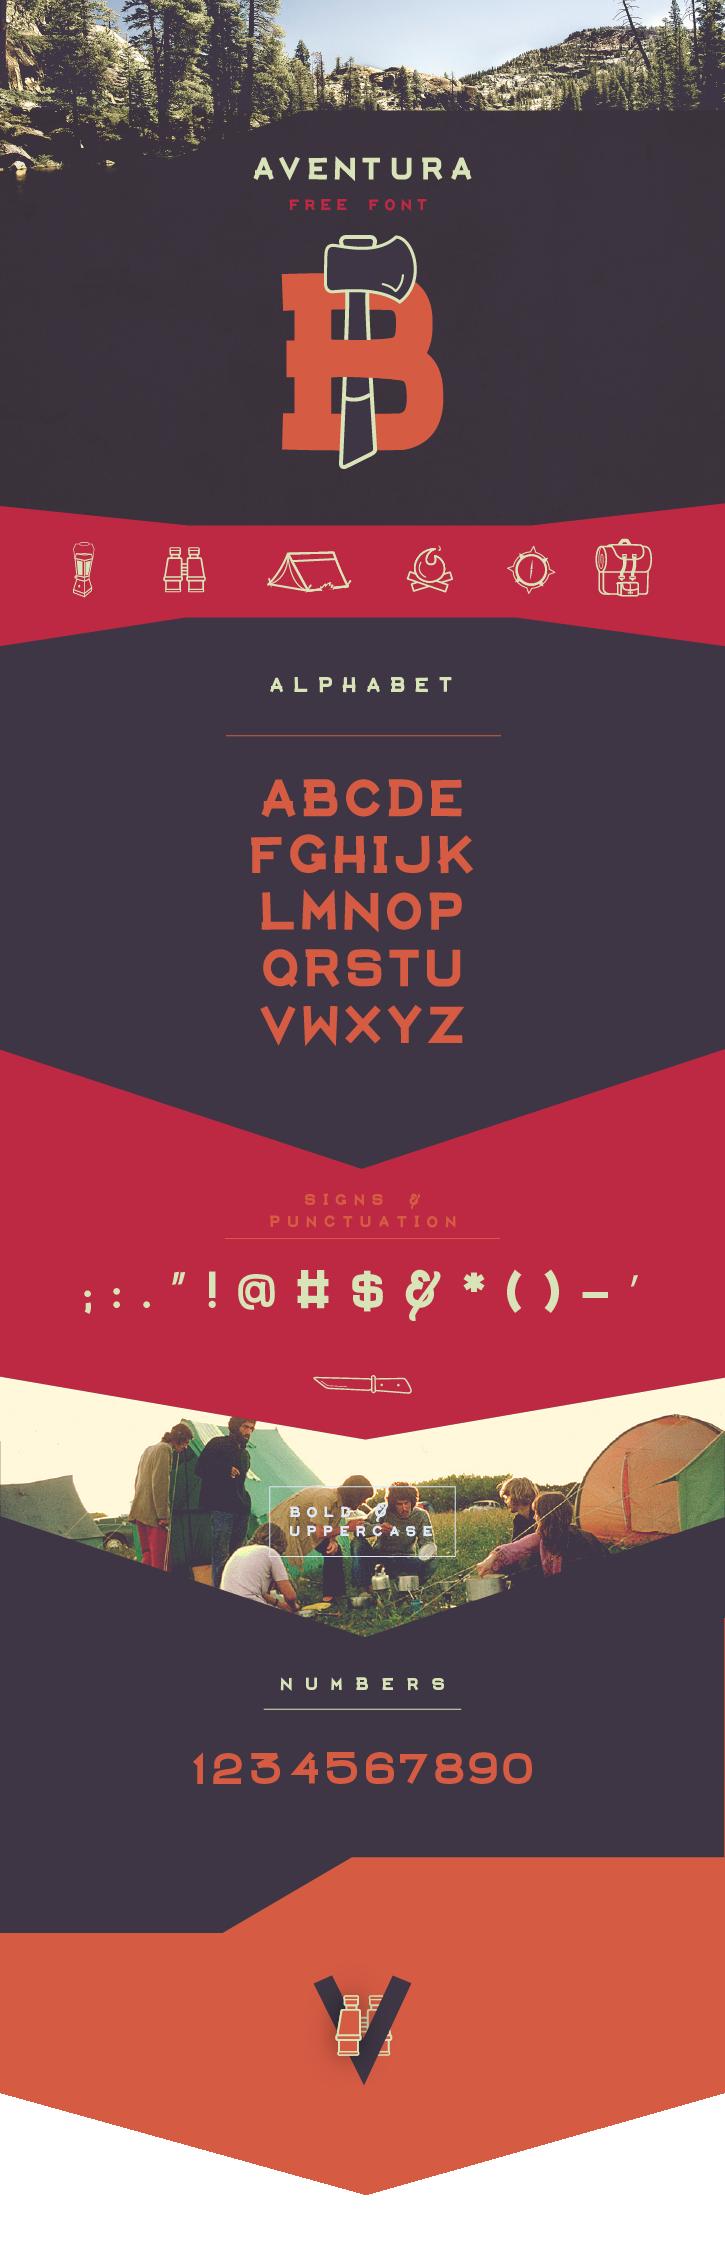 AVENTURA – Free Typeface